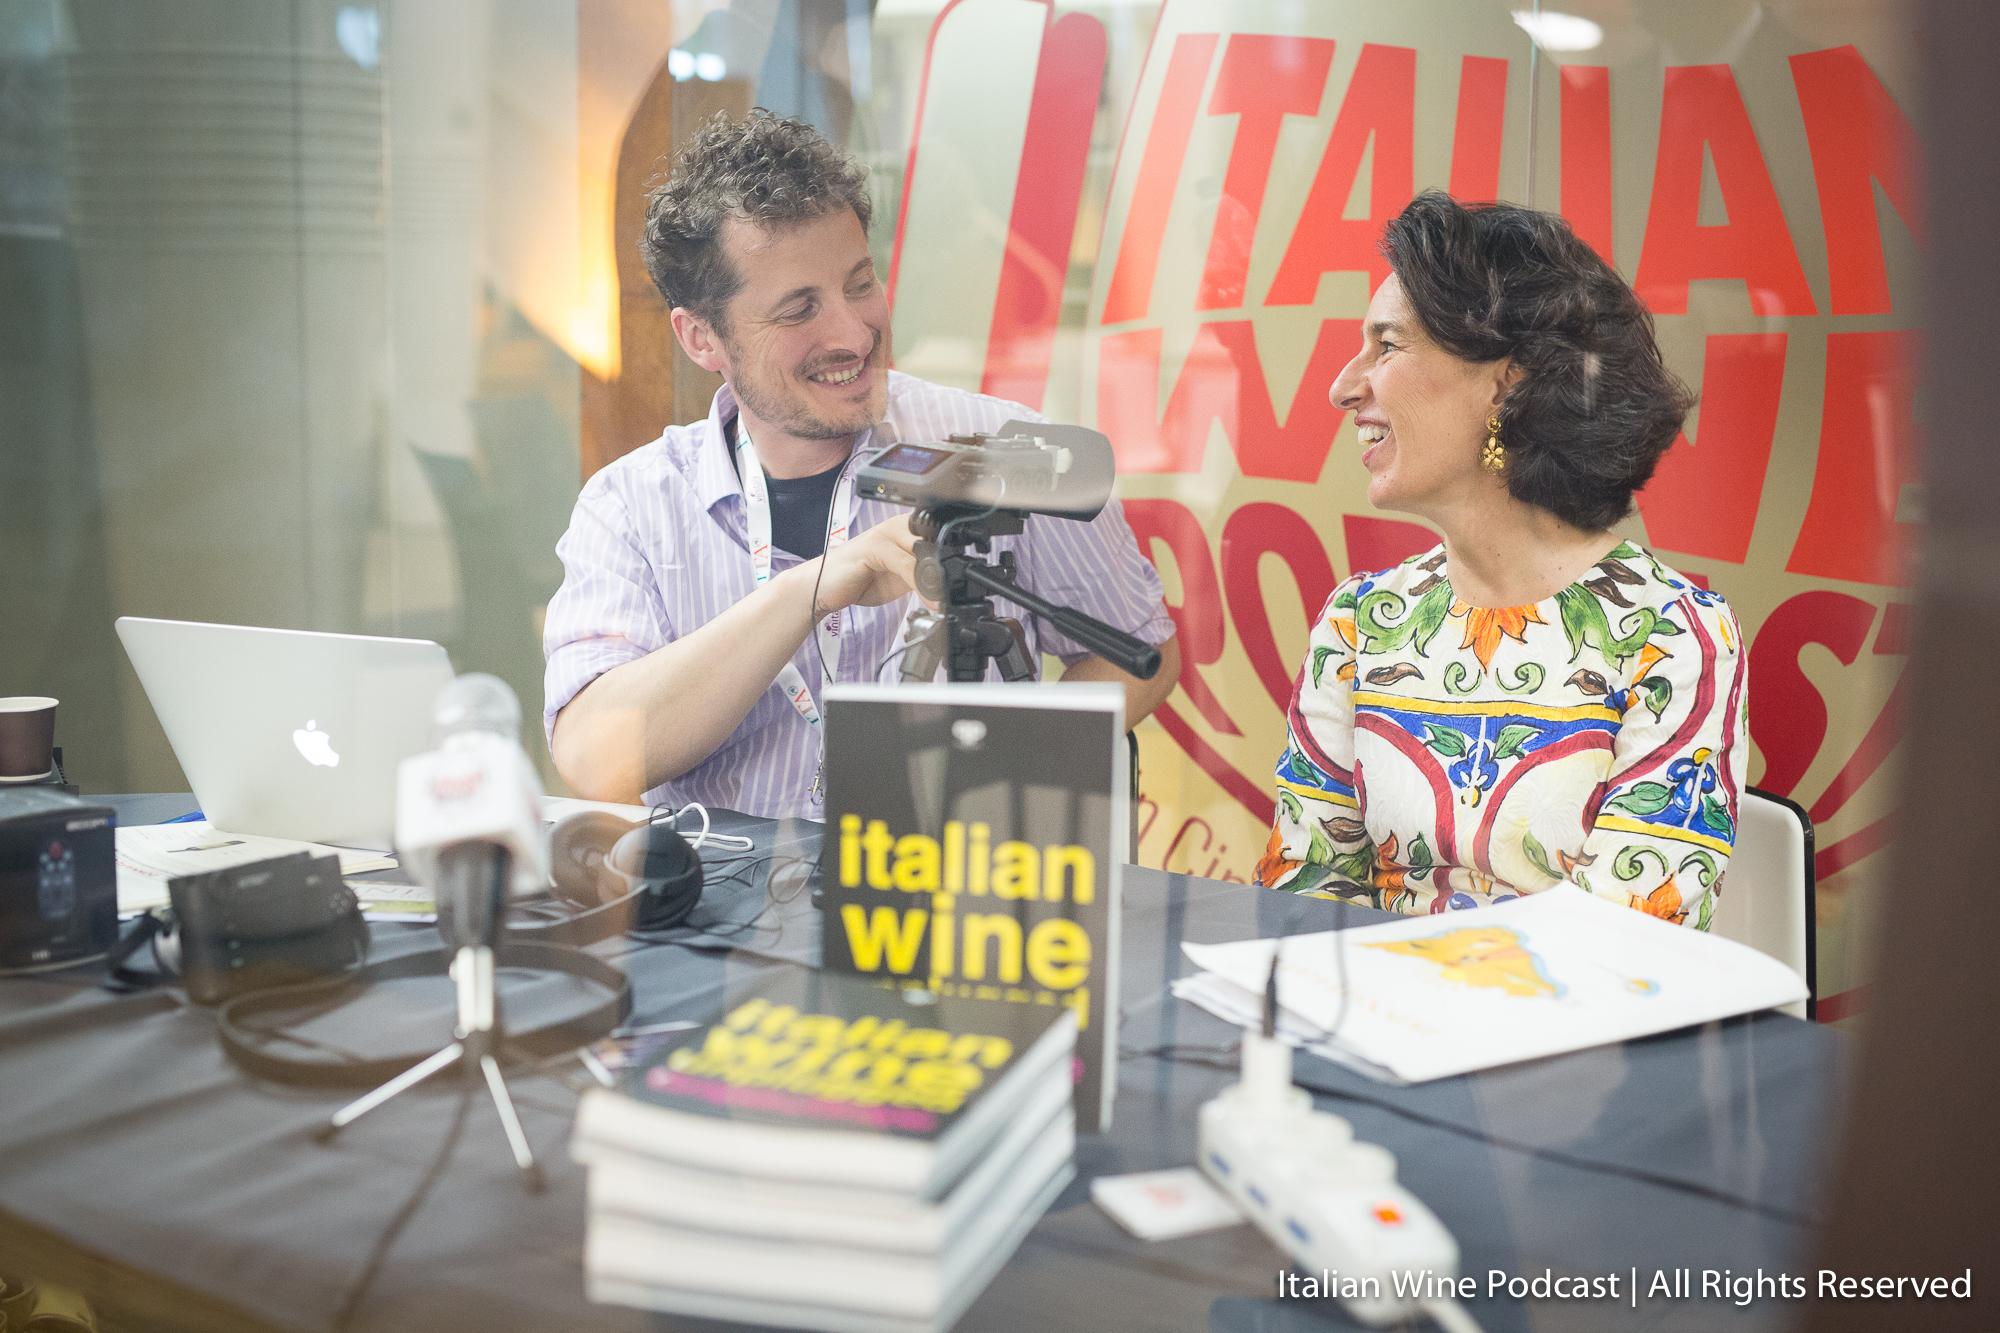 Monty Waldin (left) interviews José Rallo (right) whose family owns the Donnafugata winery in Sicily